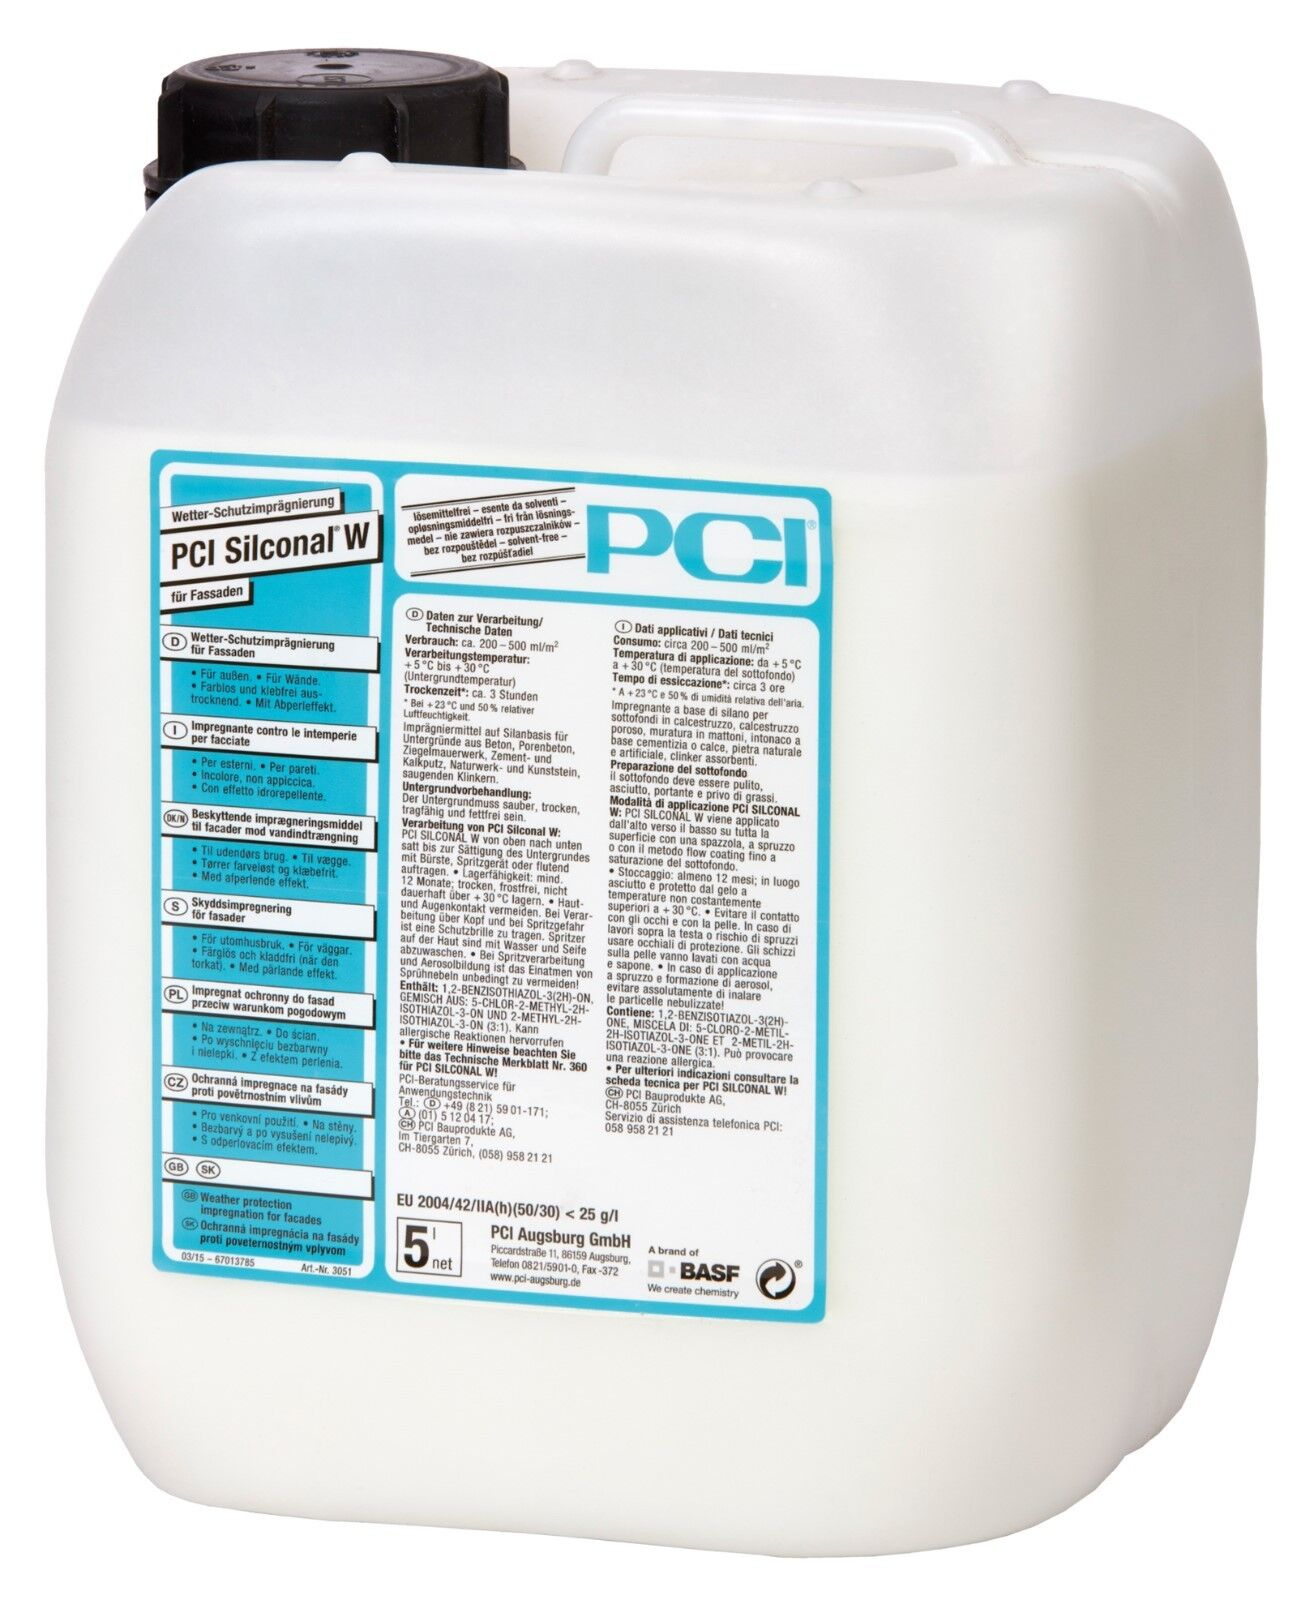 PCI Silconal W 5 L Wetter Schutz-Imprägnierung Fassade Hydrophobierung Putz